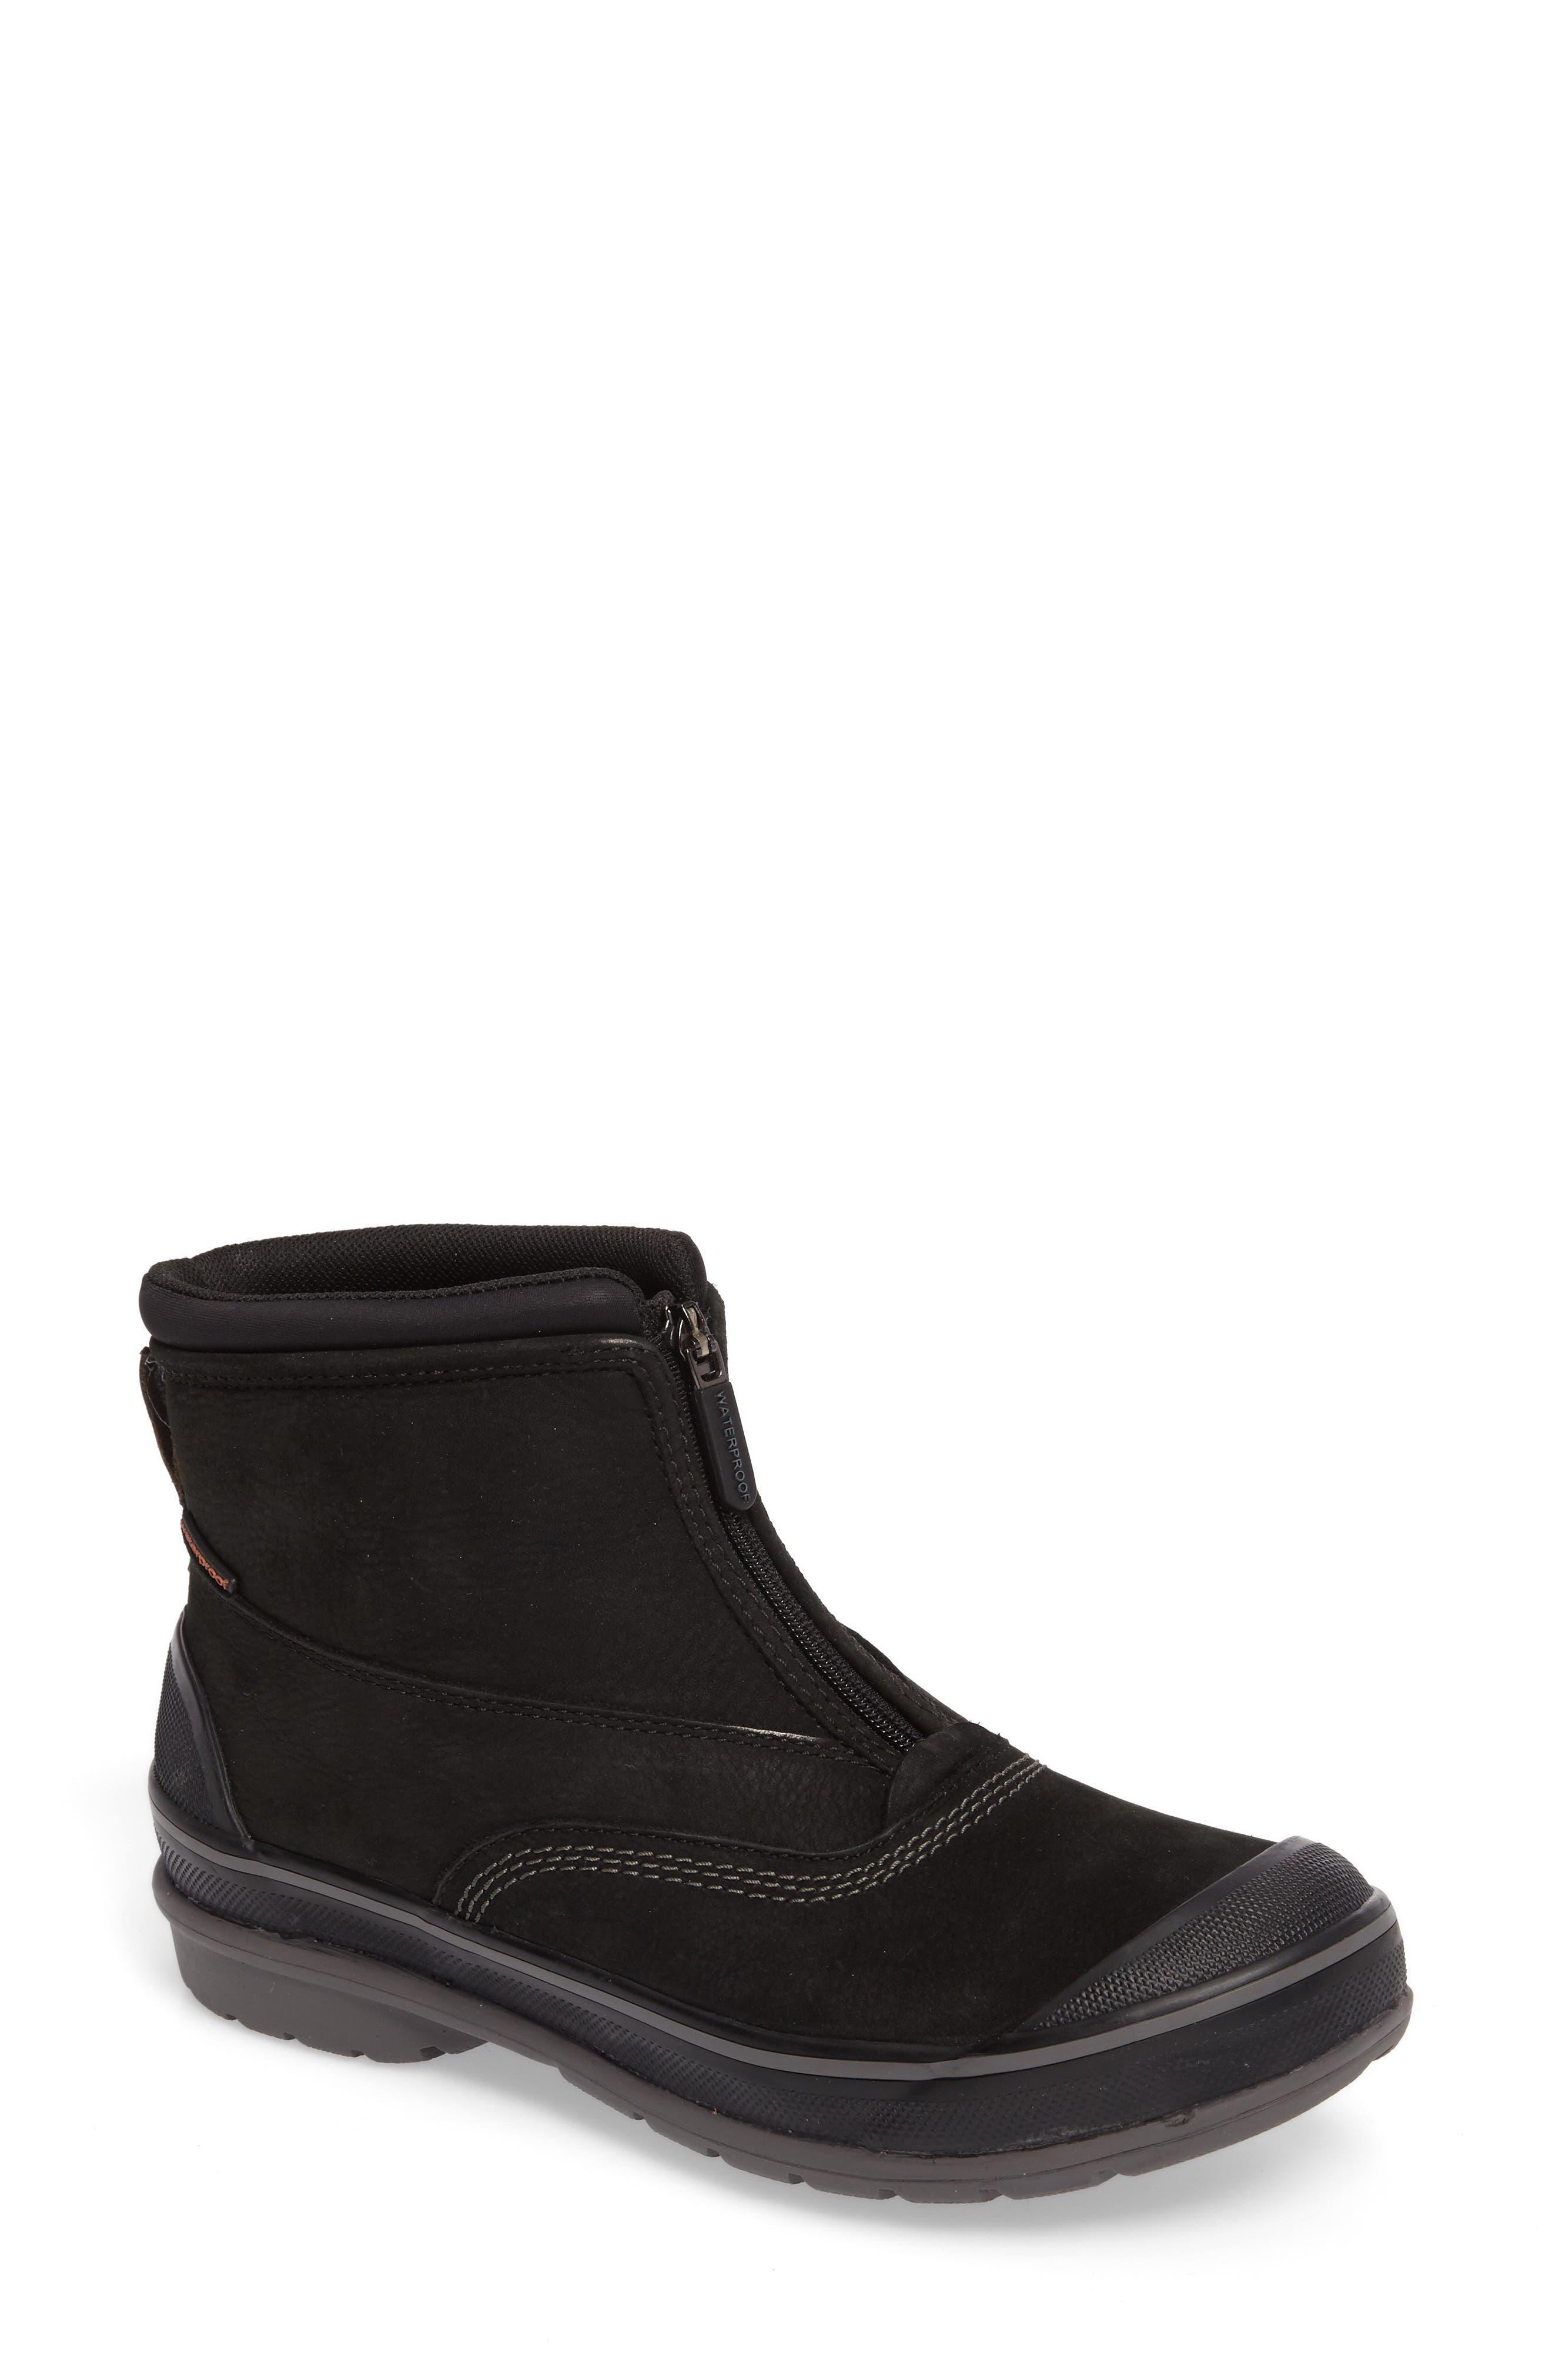 Muckers Hike Waterproof Boot,                         Main,                         color,